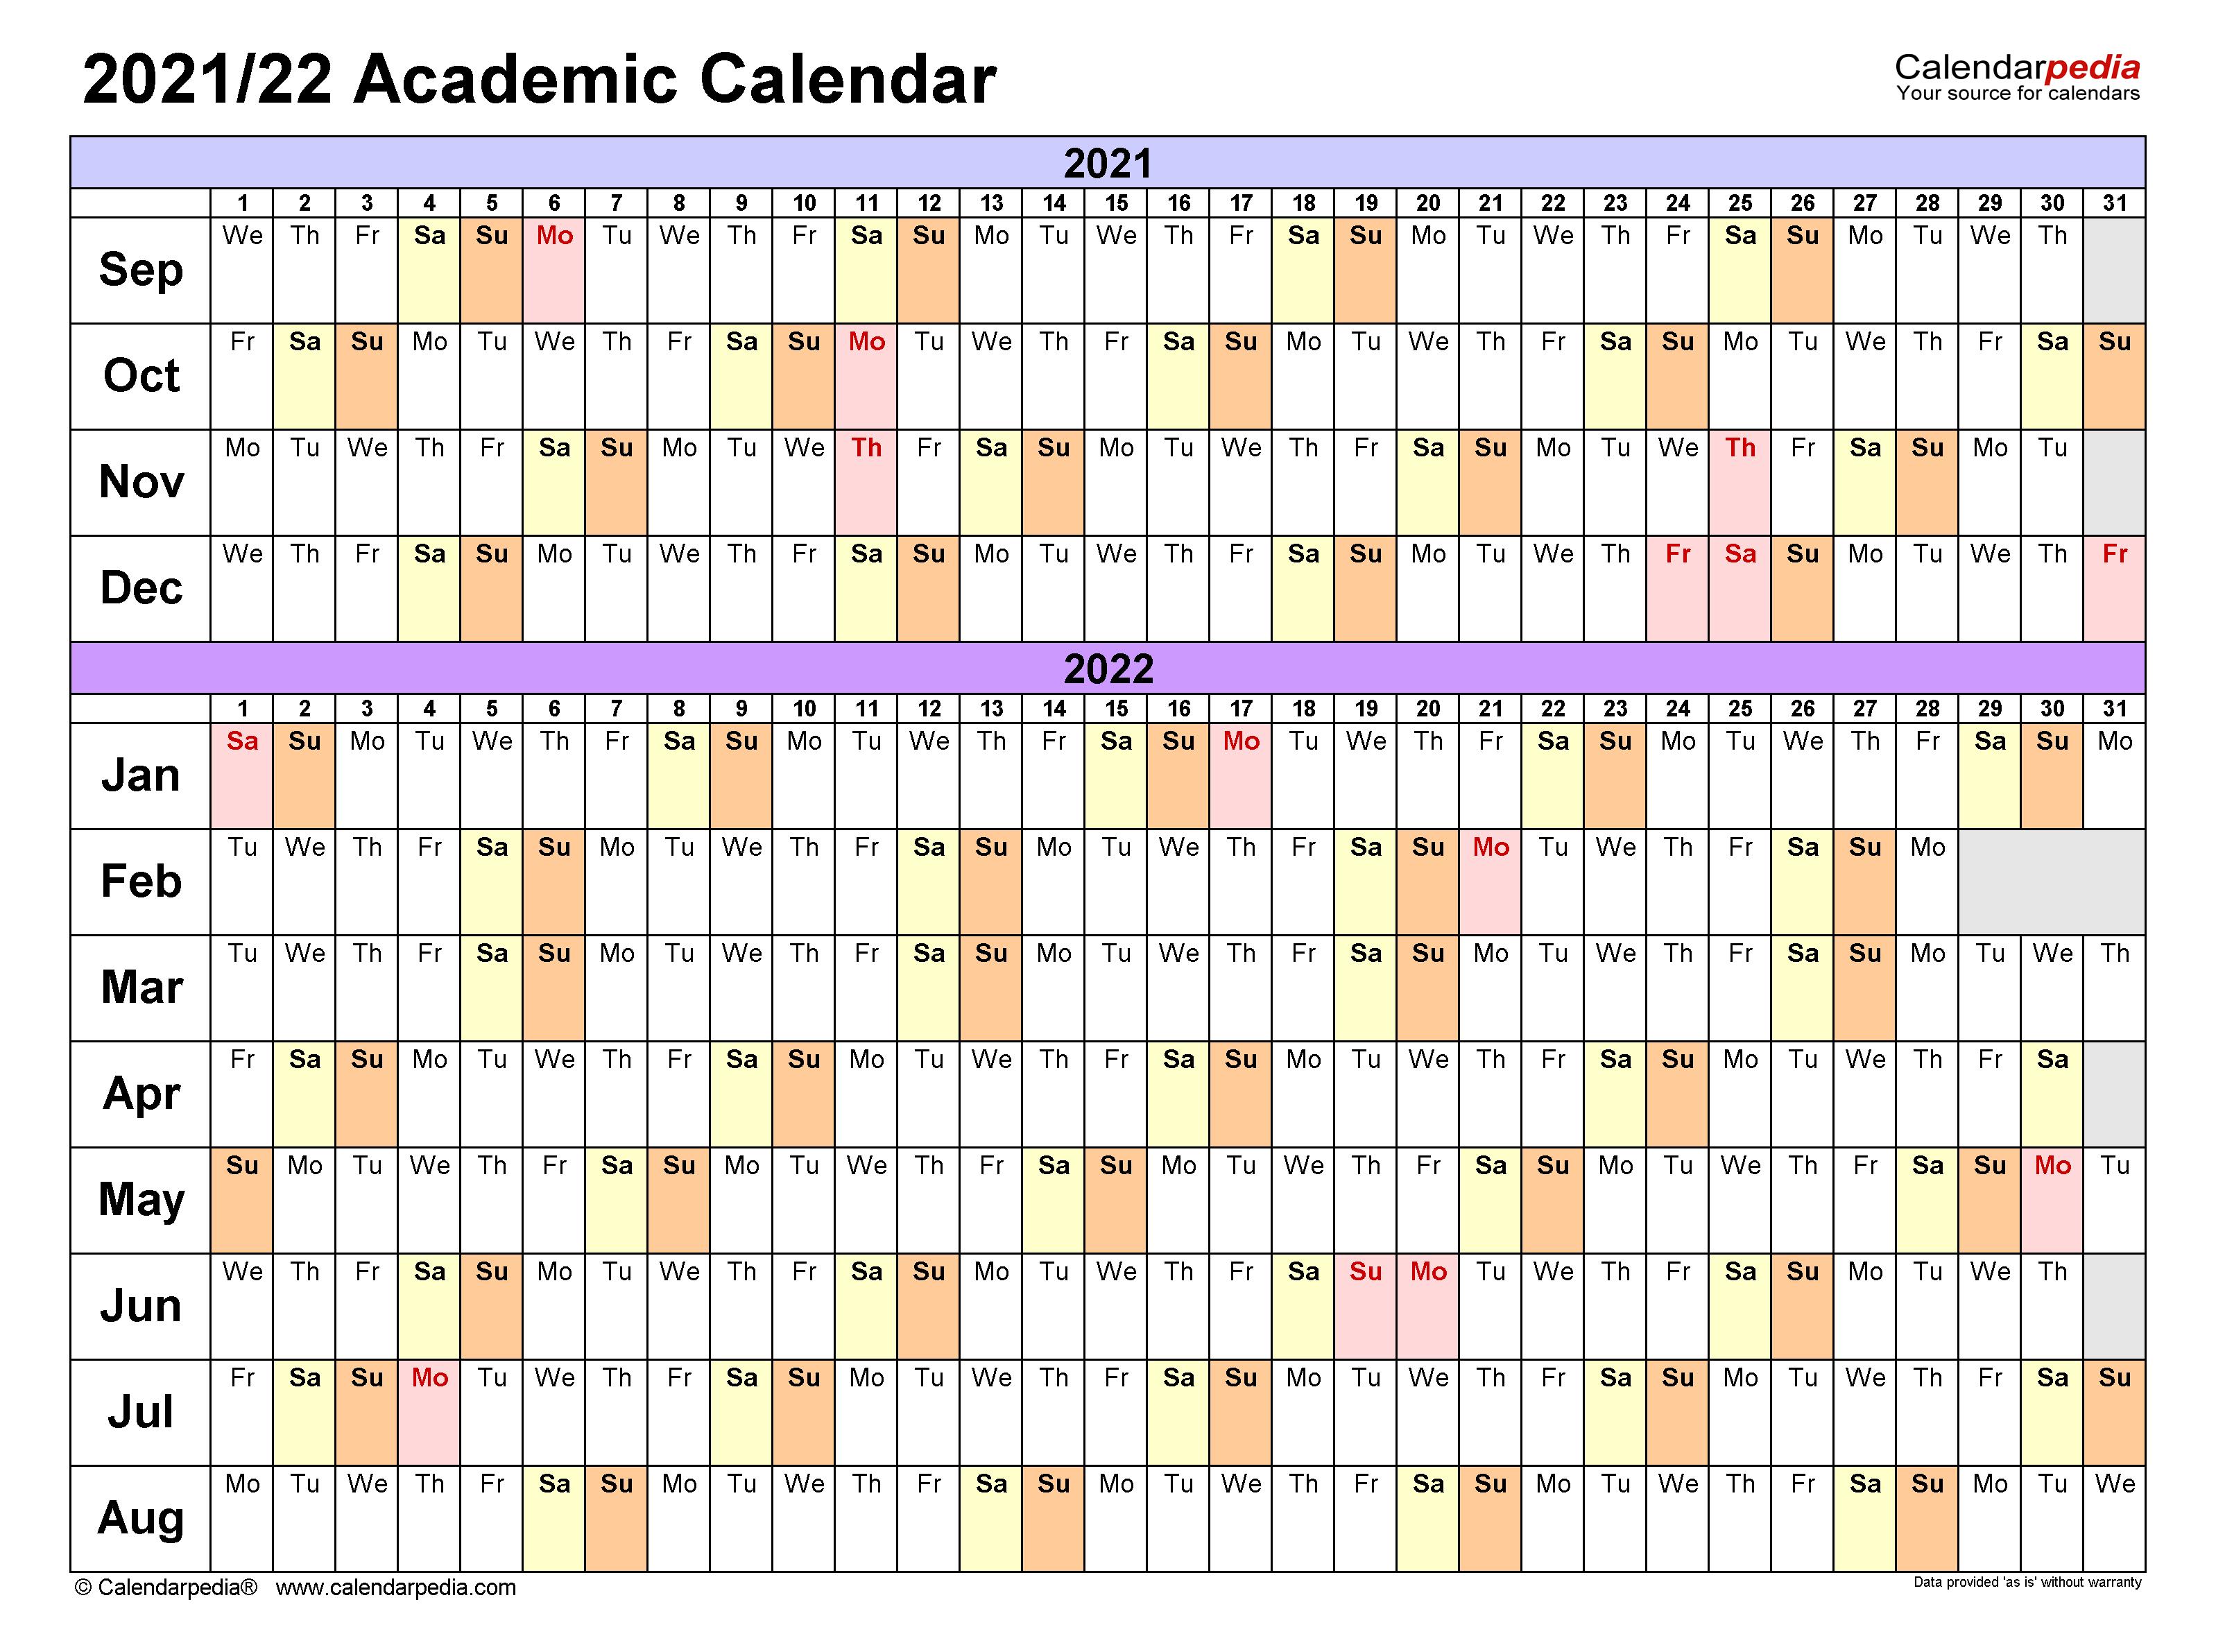 Fall 2022 Academic Calendar.Academic Calendars 2021 2022 Free Printable Excel Templates